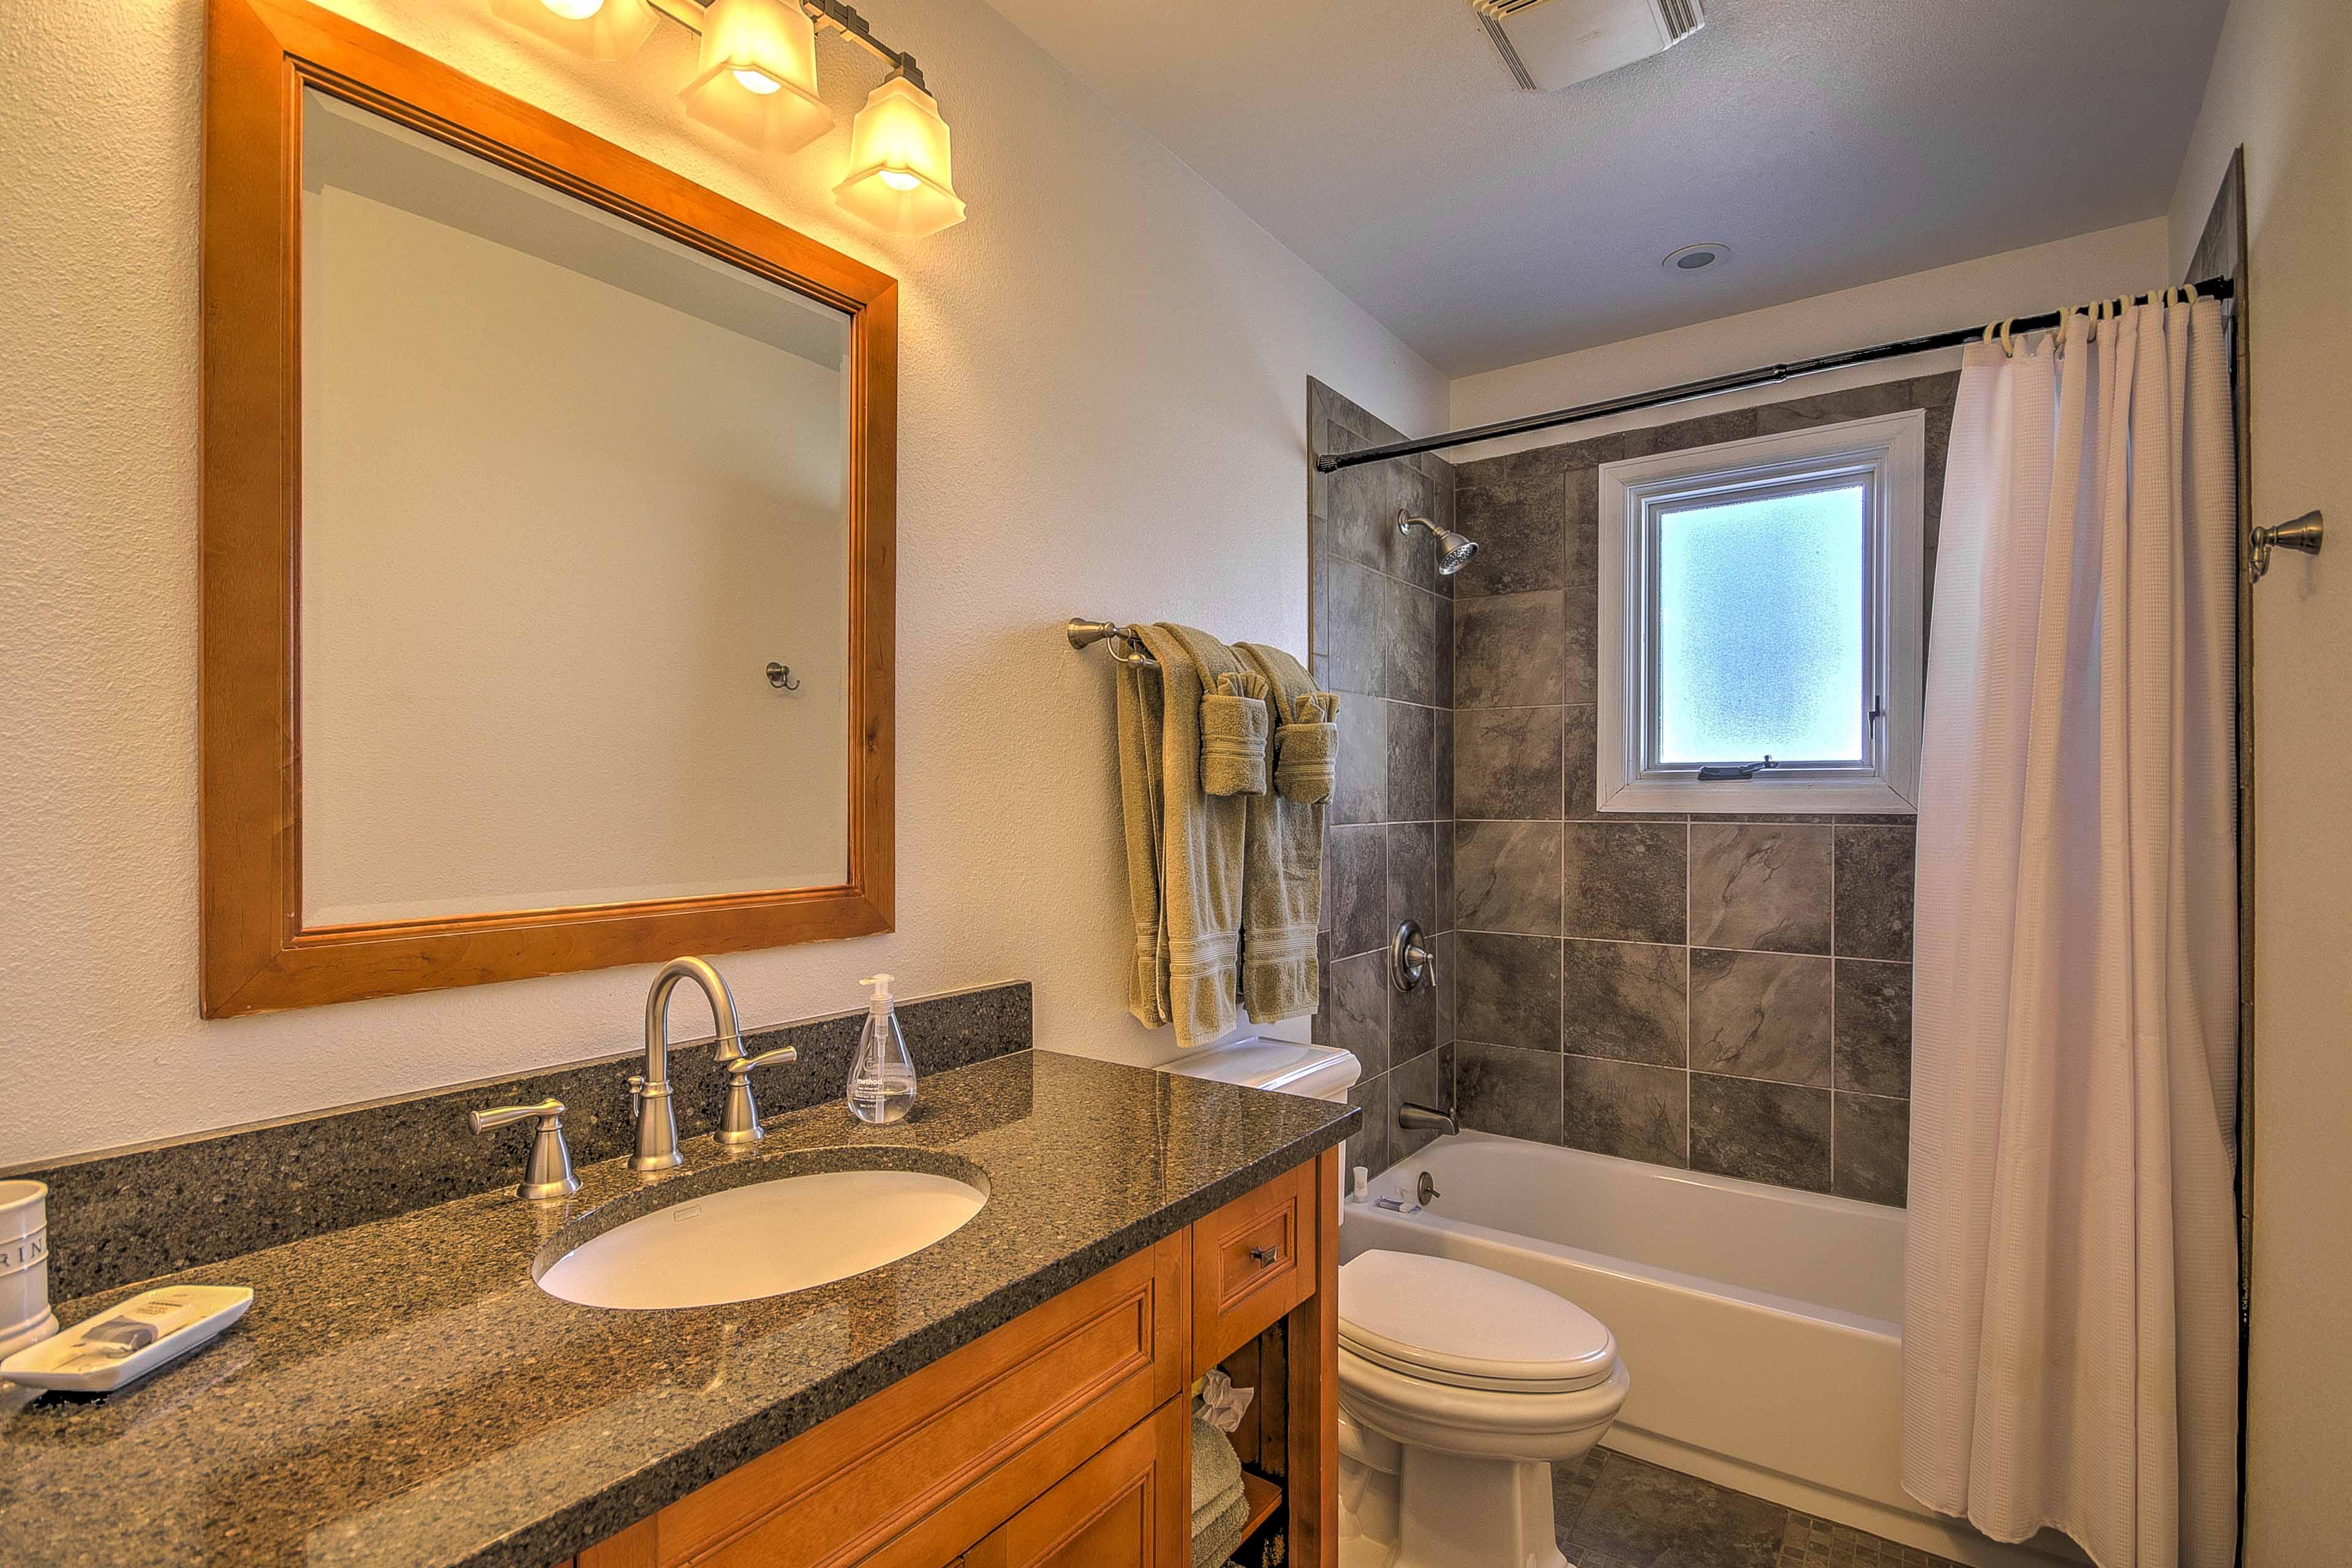 The en suite bathroom ensures maximum privacy and convenience.